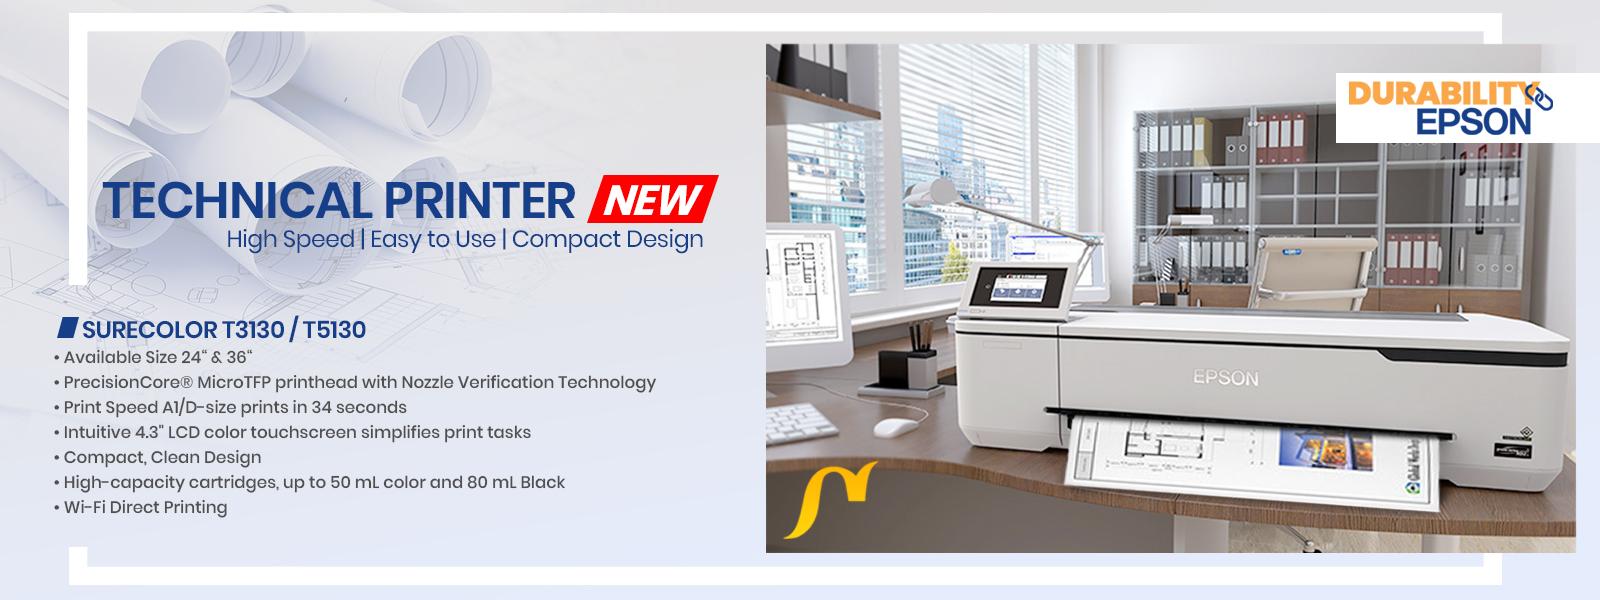 epson technical printer